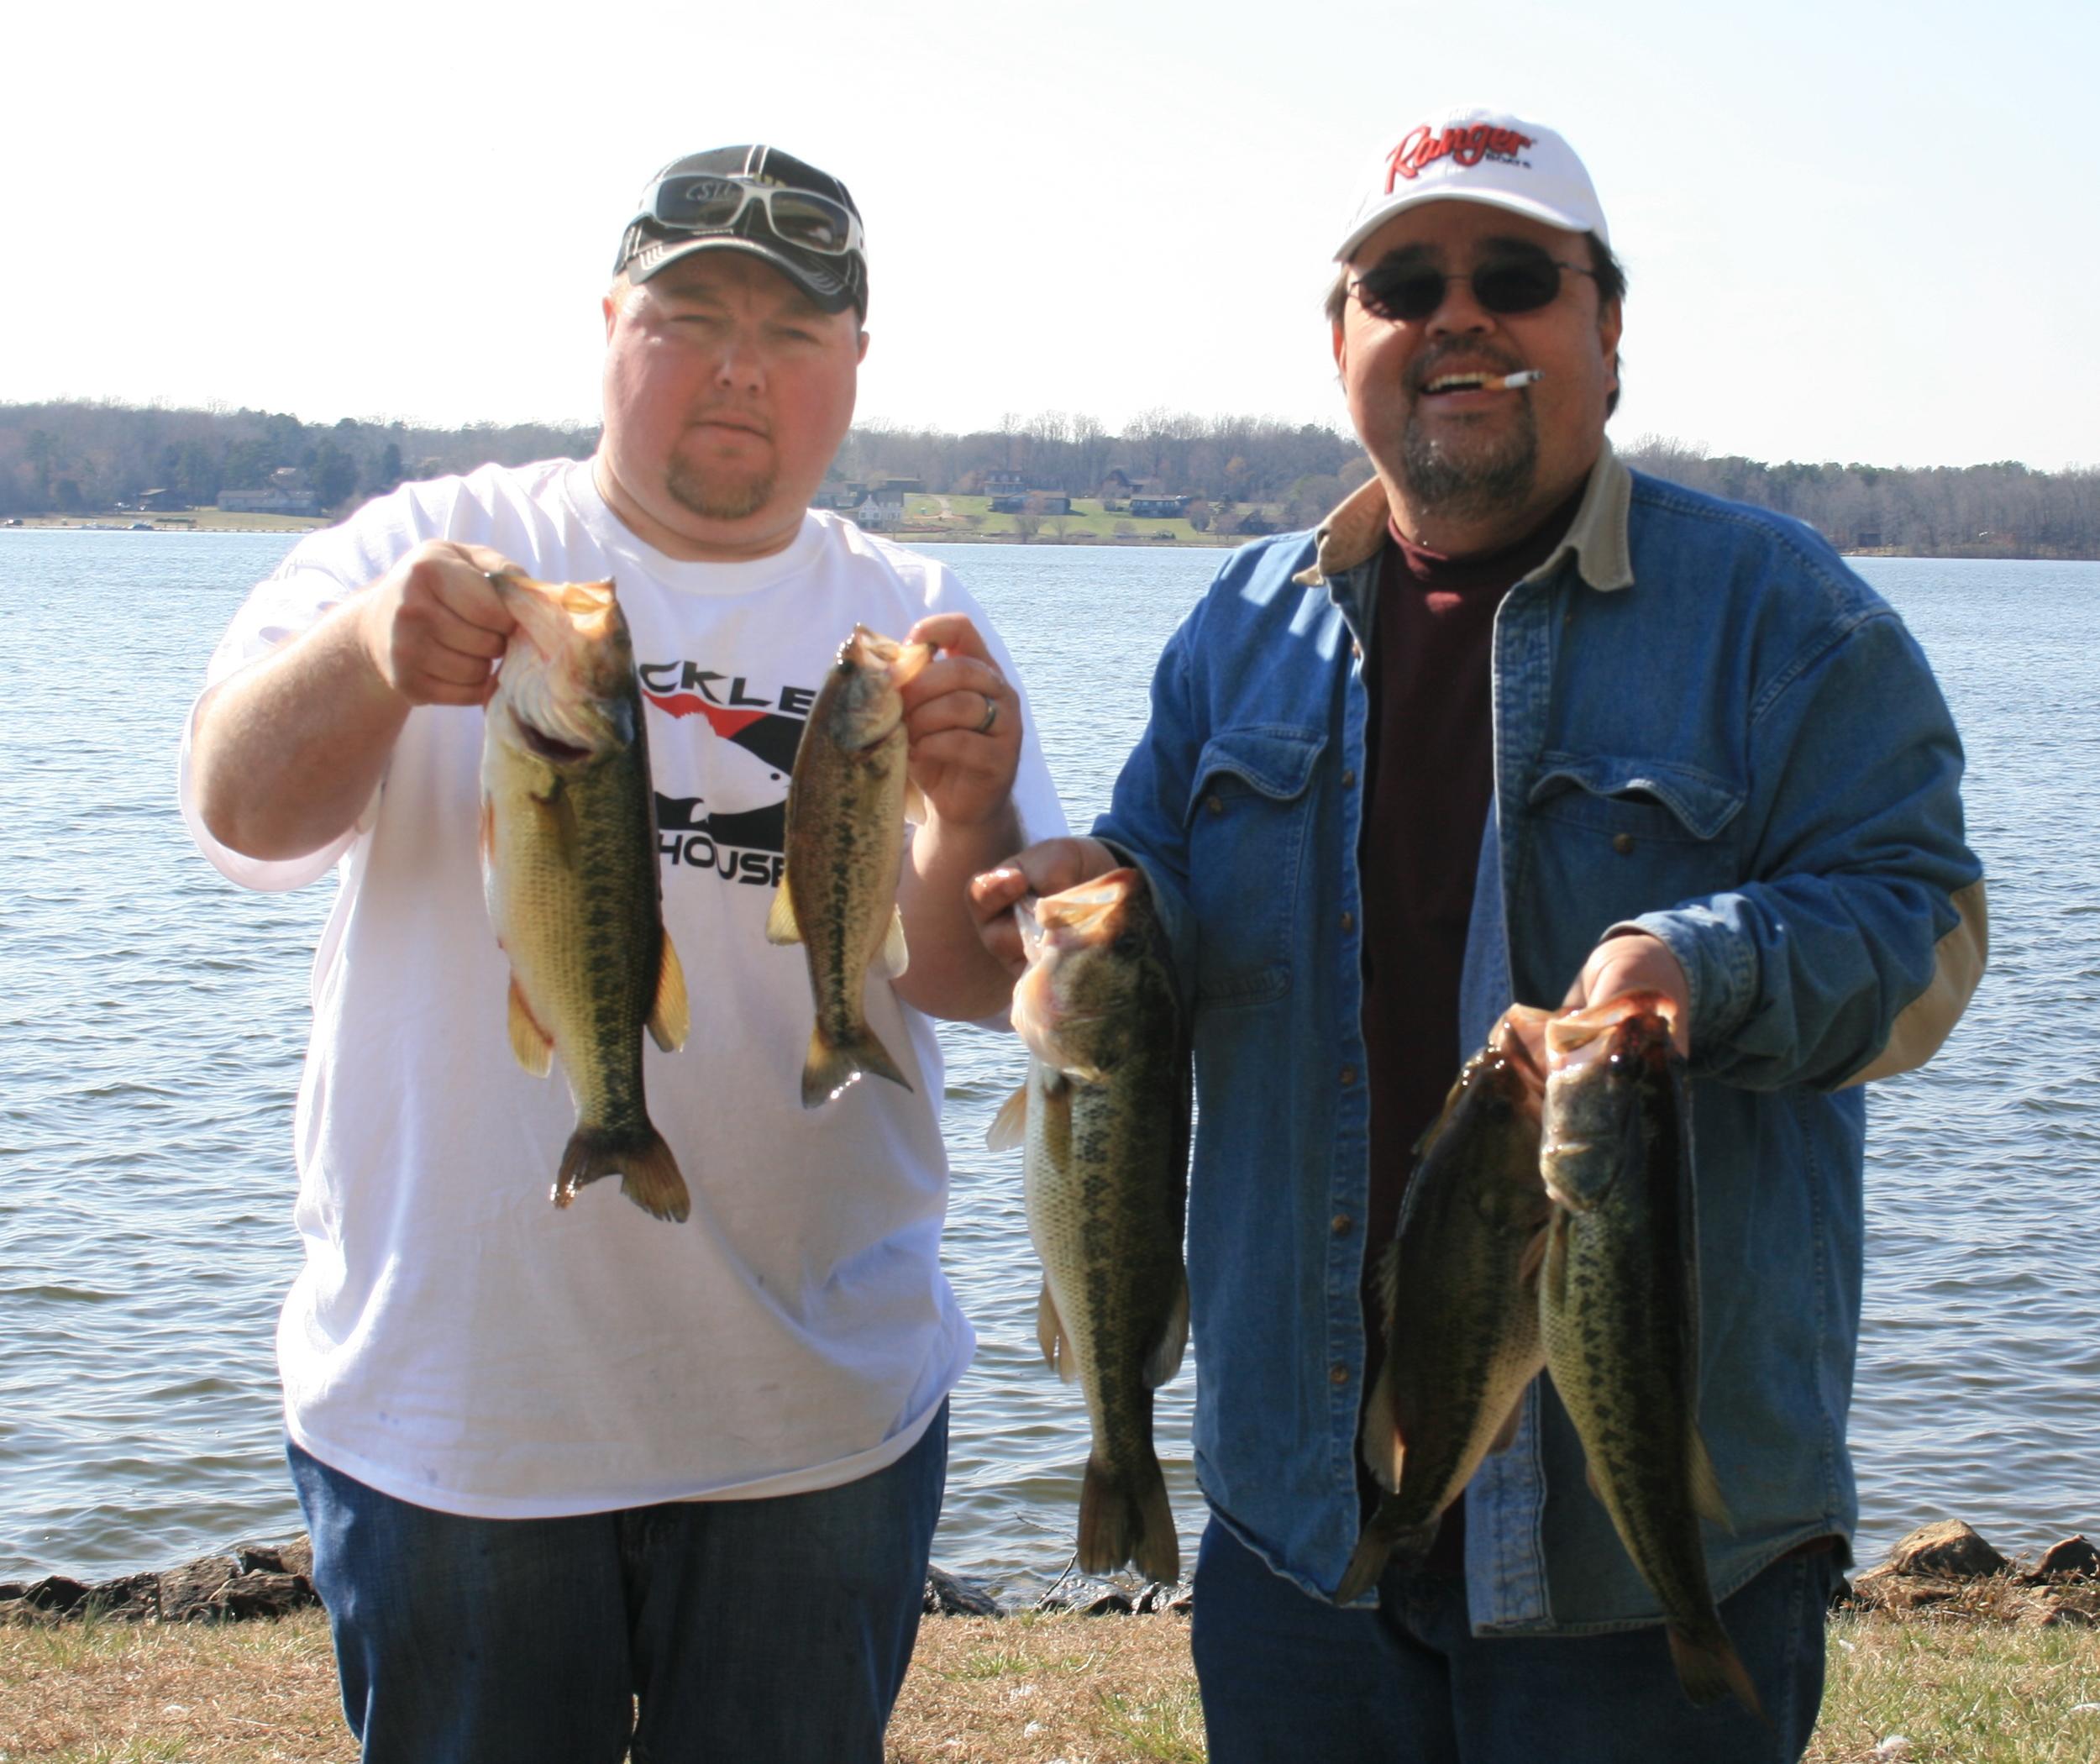 Tim and Joe Tebo Third Place 12.08 lbs.